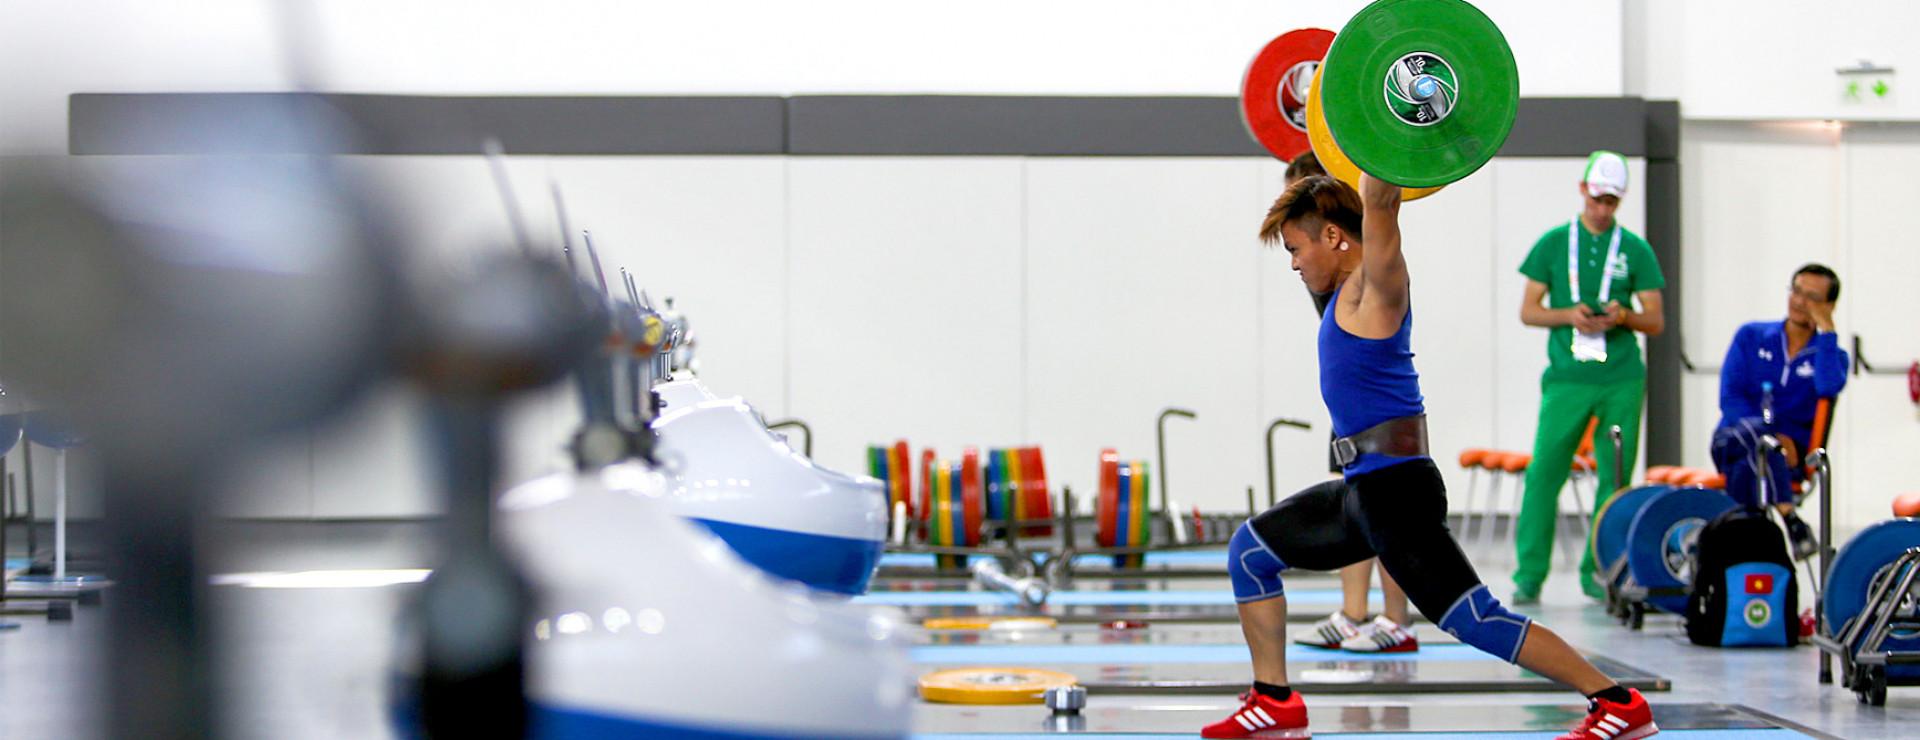 The 2018 IWF World Championships are due to begin in Ashgabat tomorrow ©Ashgabat 2018